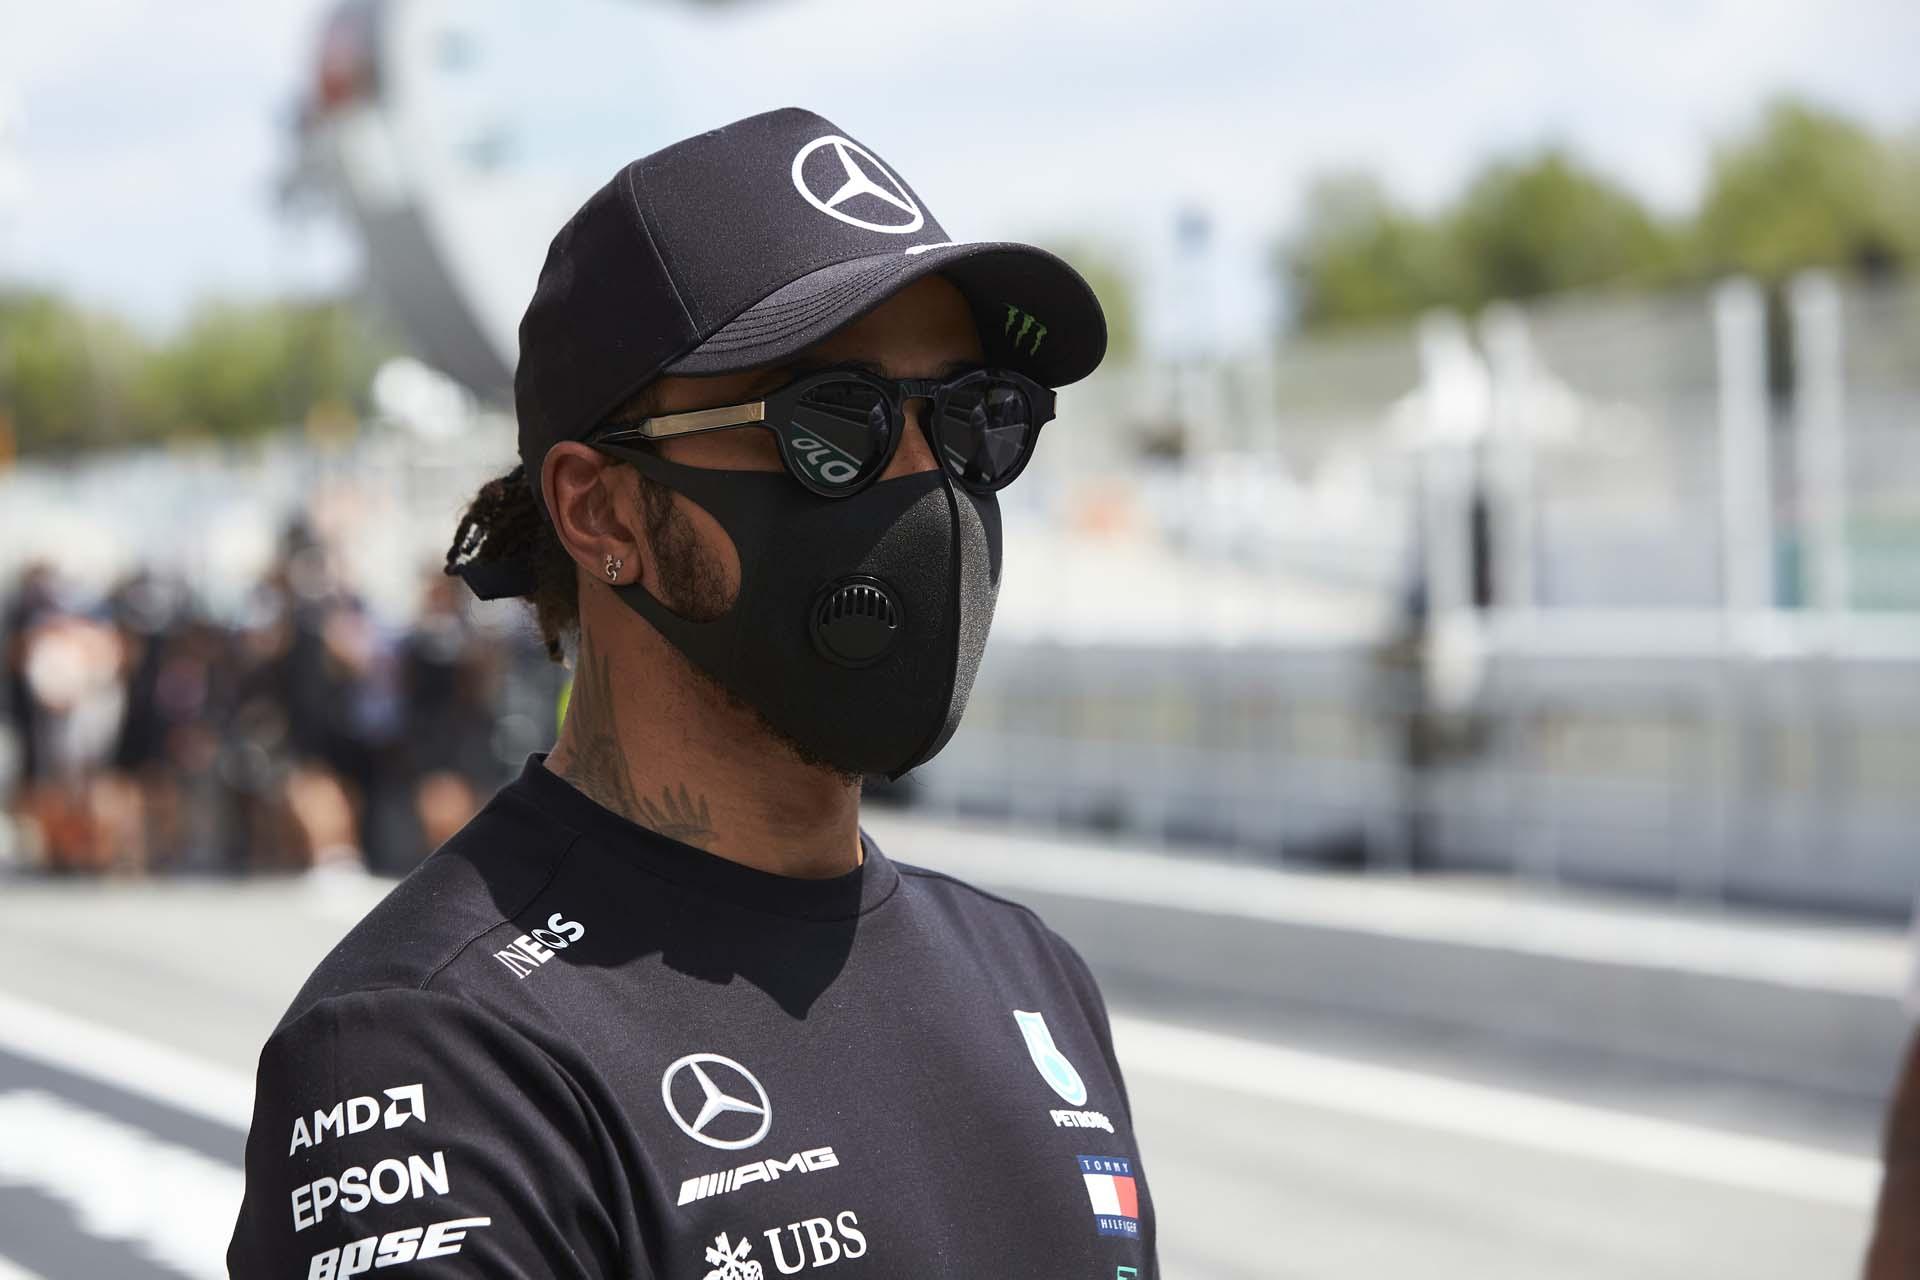 2020 Spanish Grand Prix, Sunday - Steve Etherington